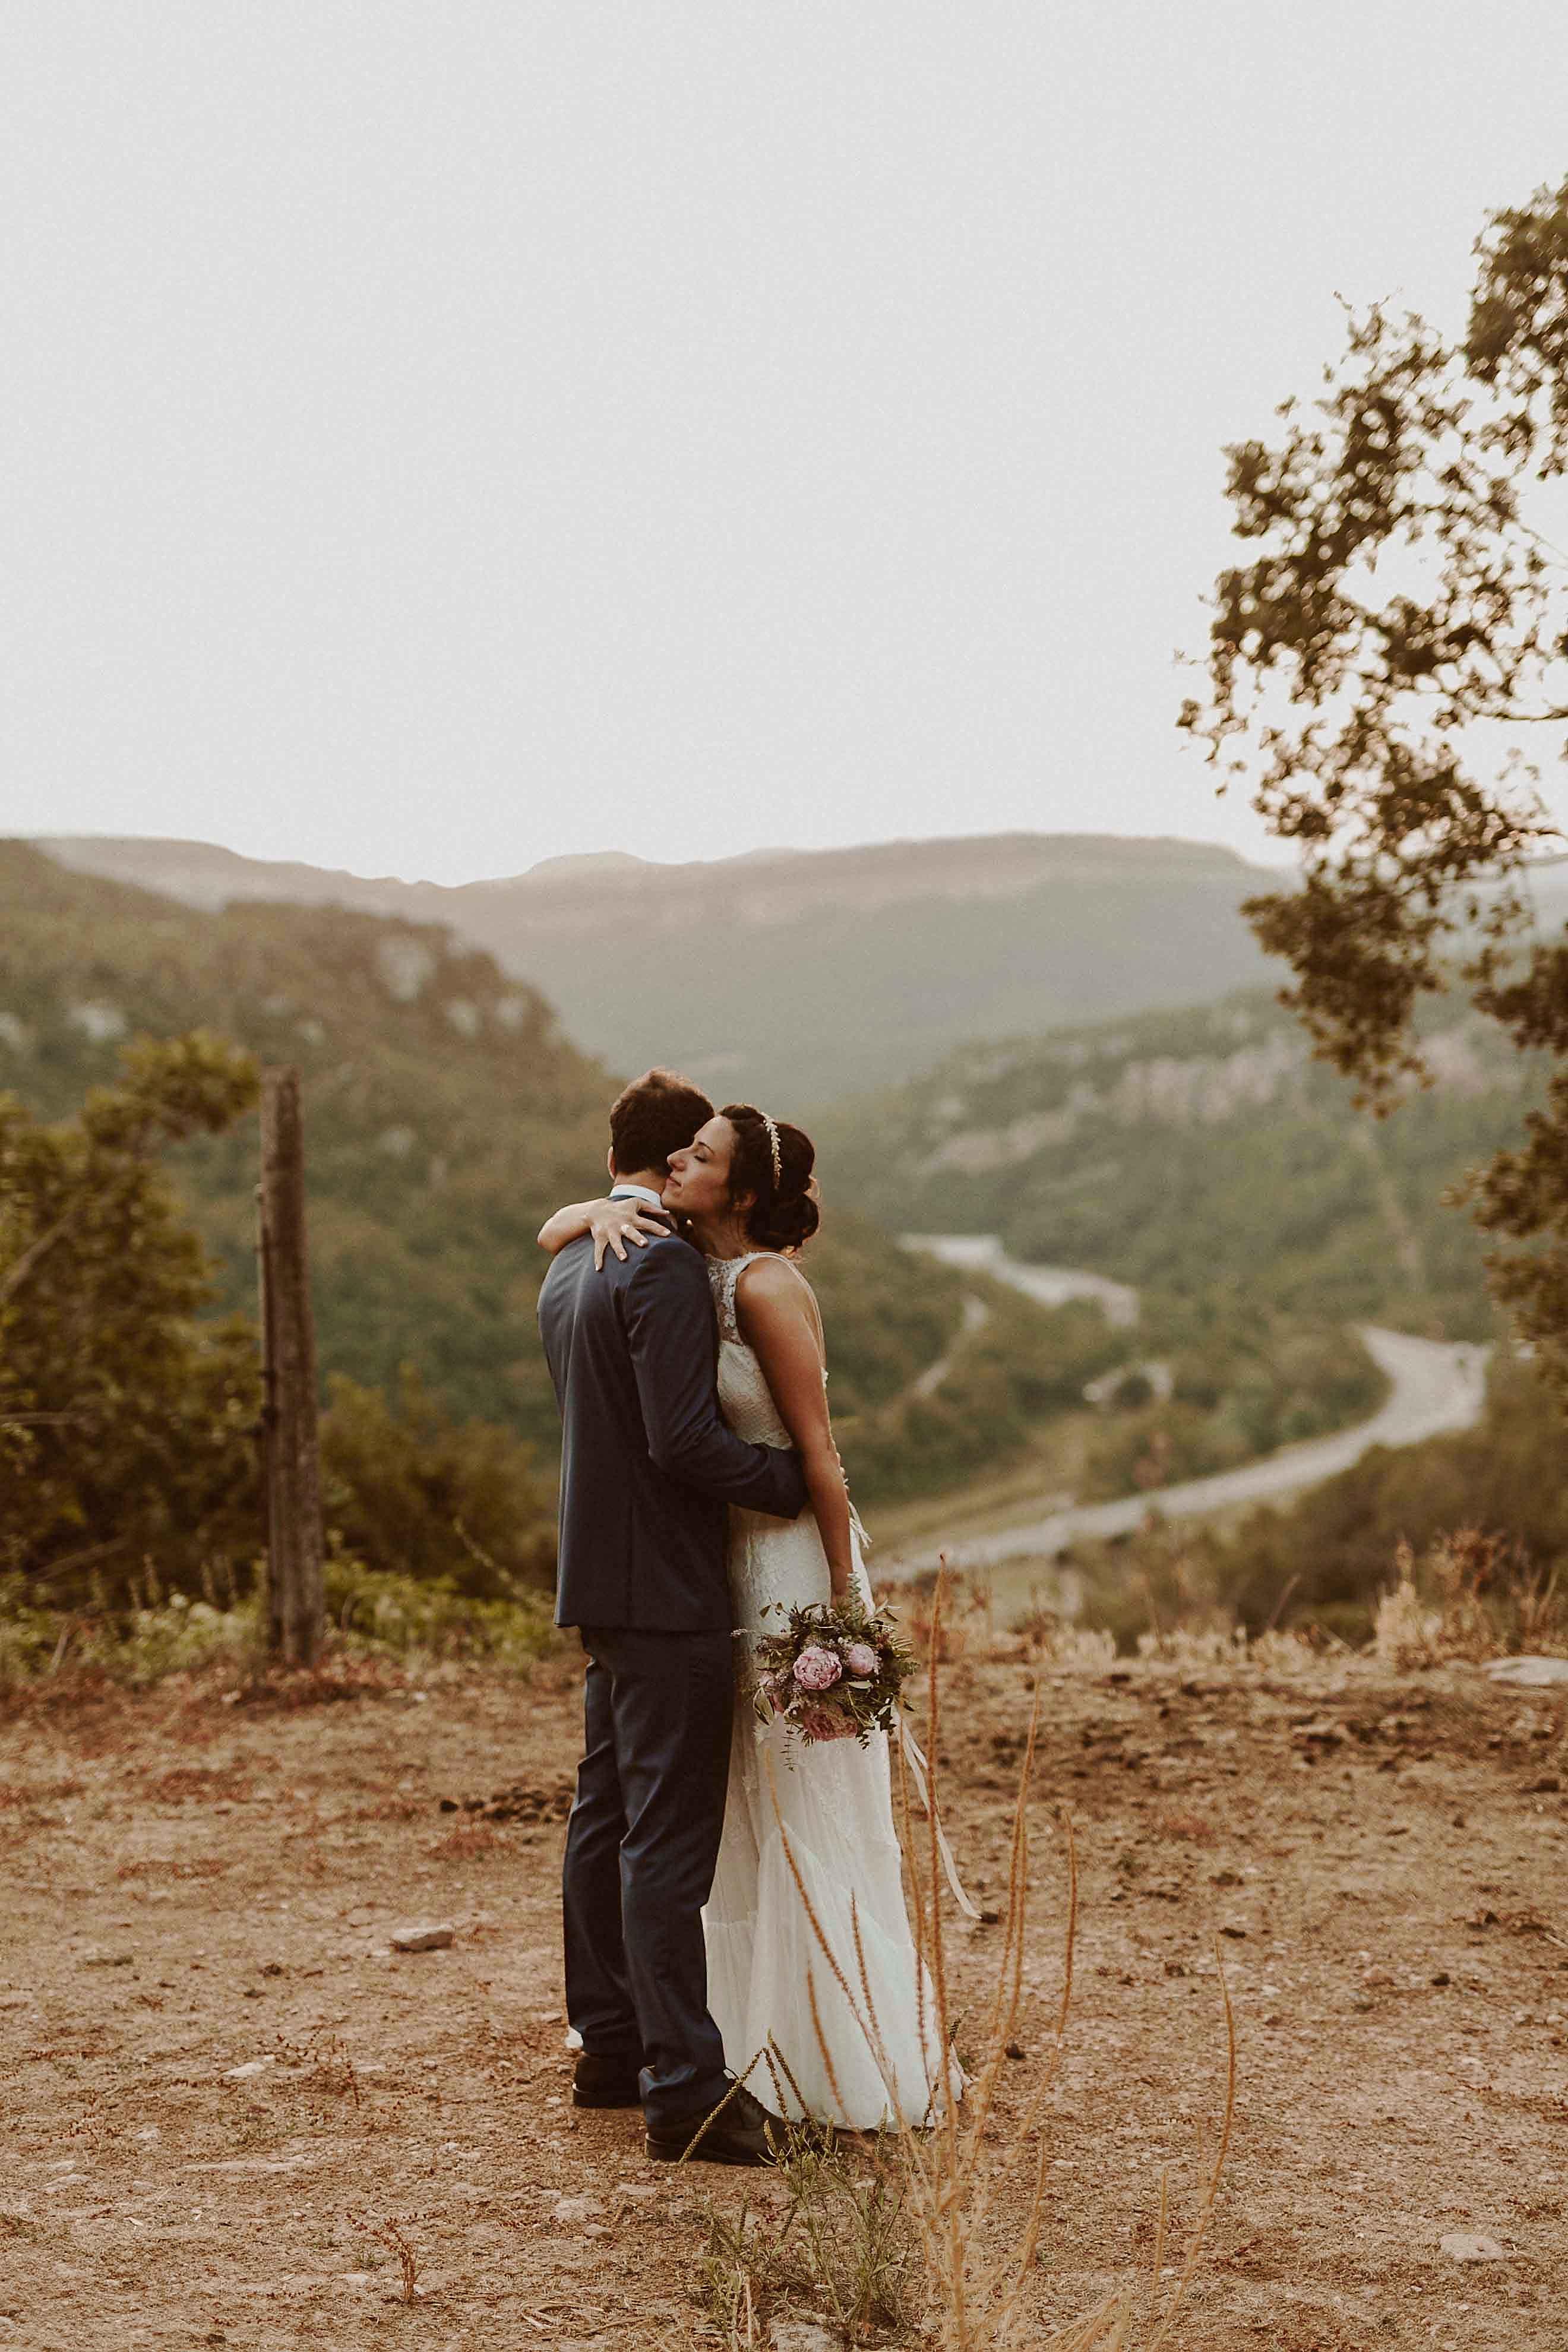 Boda rústica en la montaña. fotgrafo de bodas barcelona_087